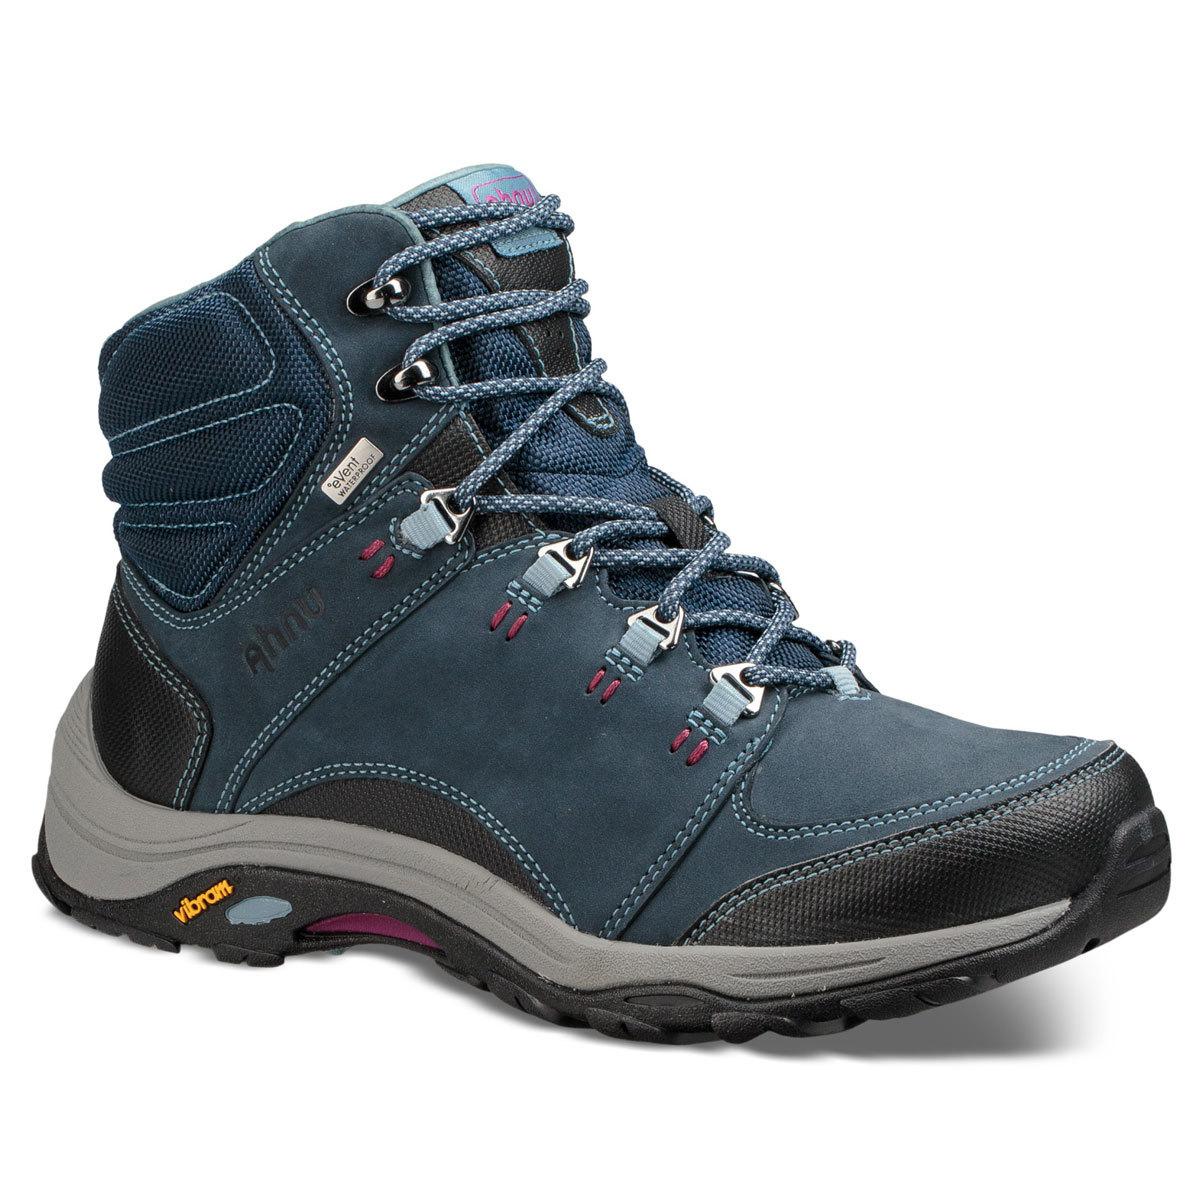 Ahnu Women's Montara Iii Event Waterproof Mid Hiking Boots - Blue, 11